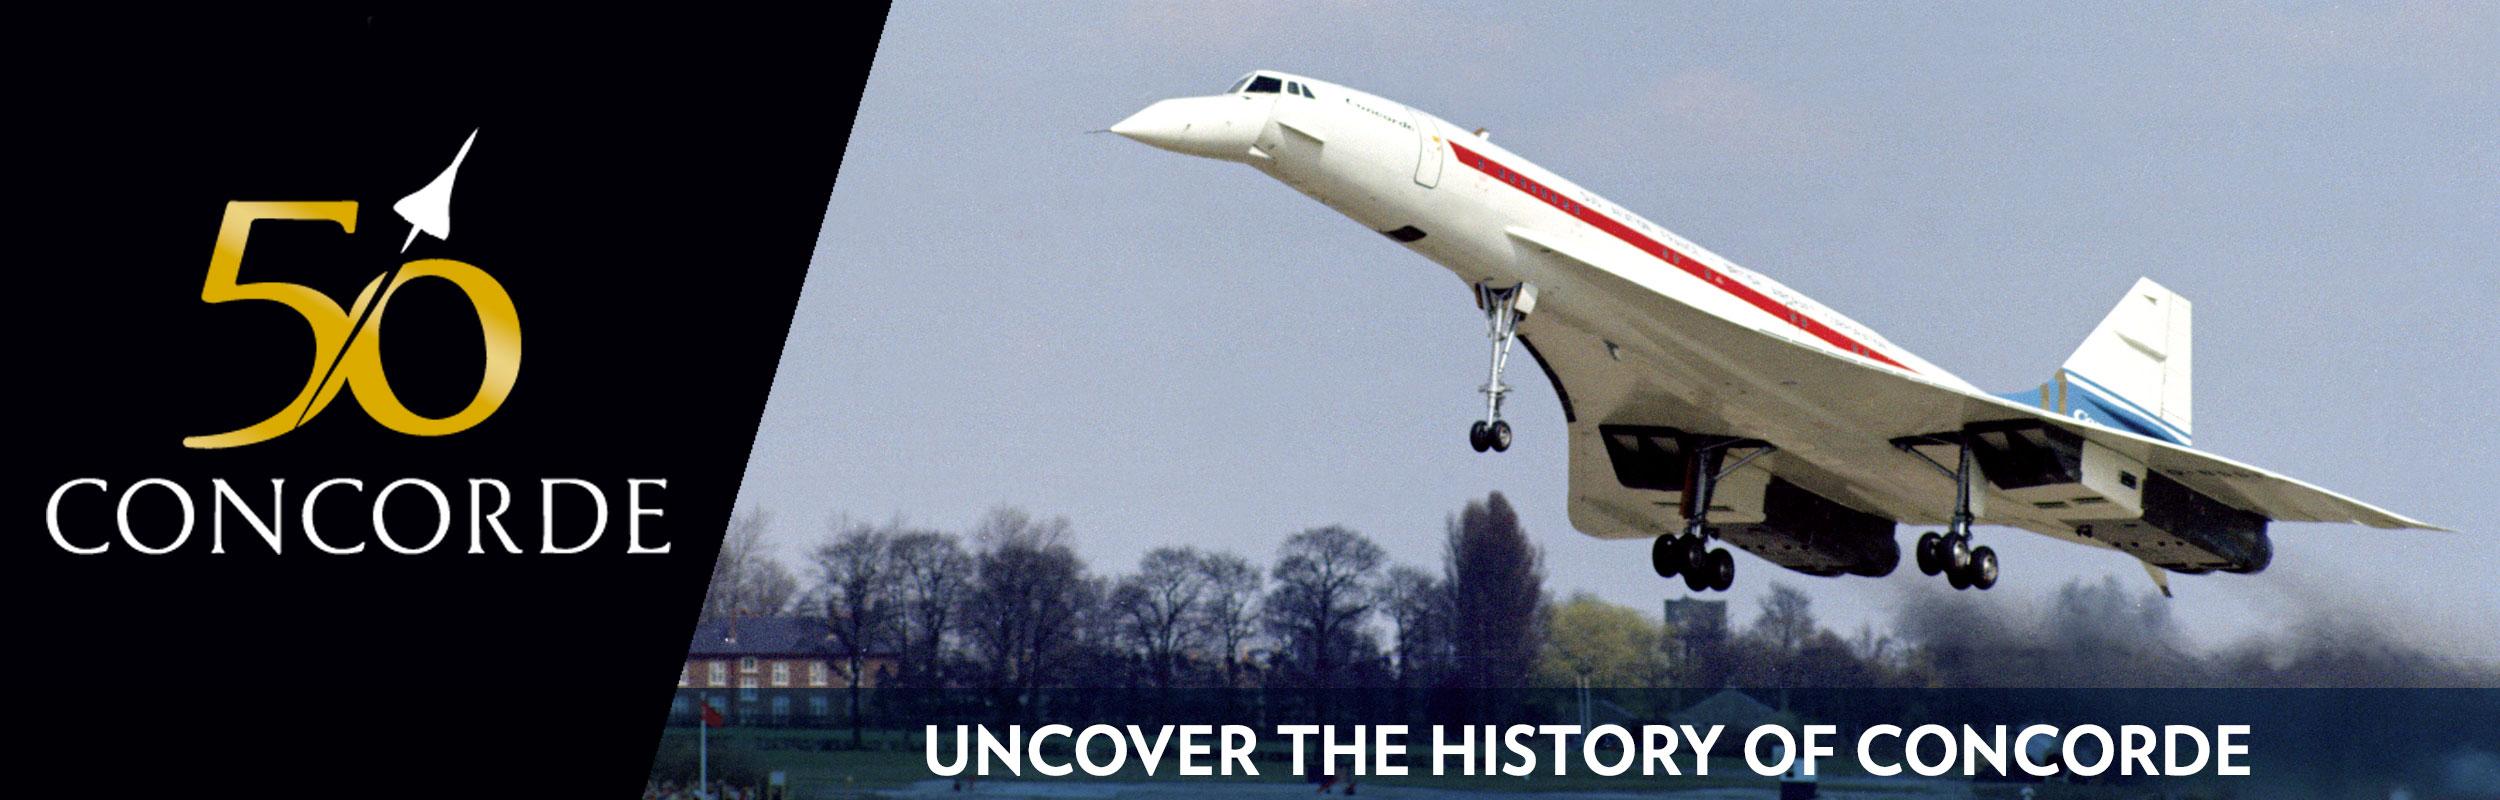 C50-History.jpg